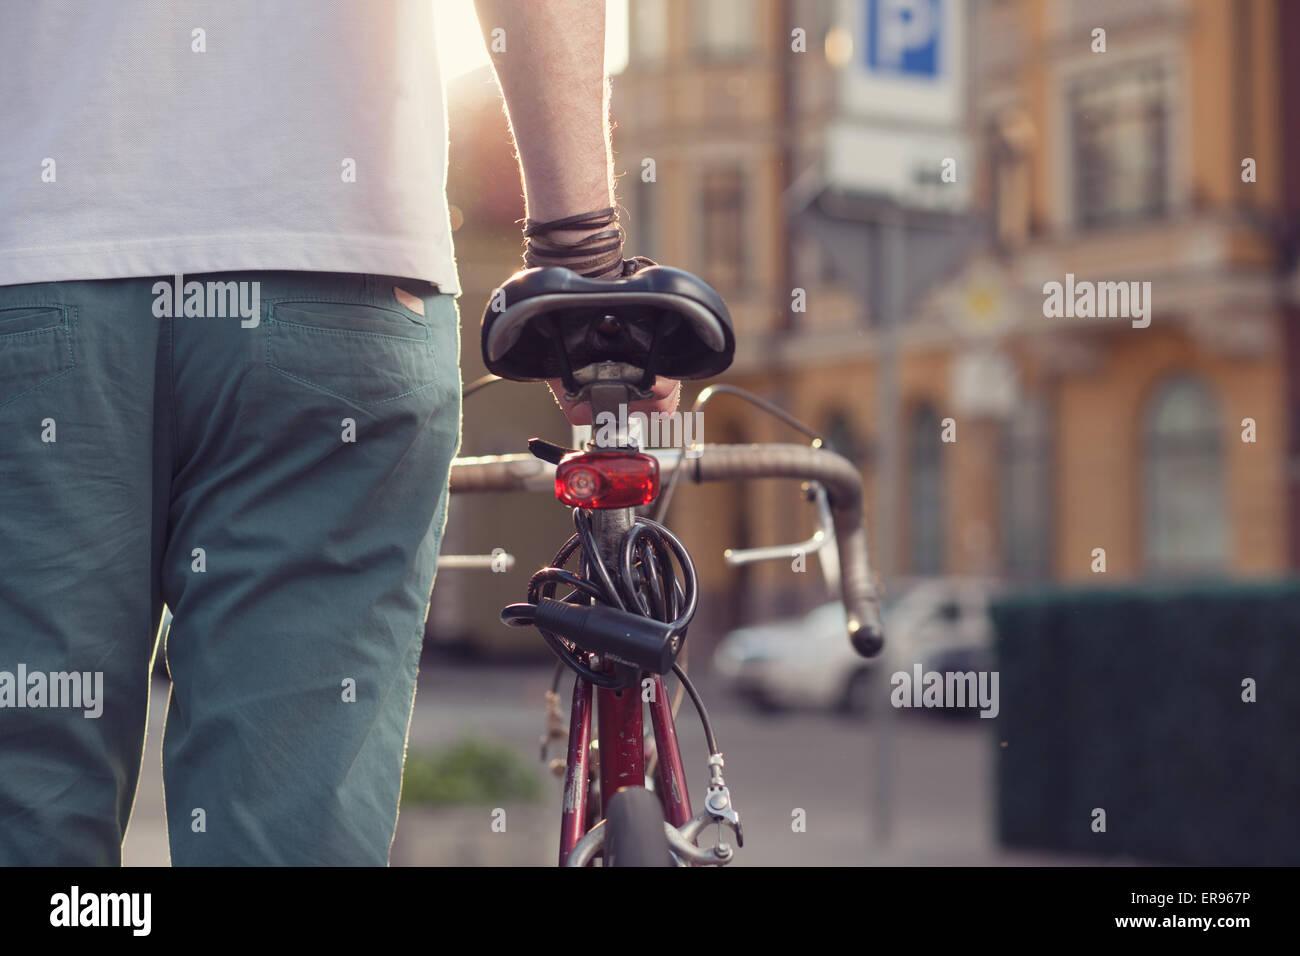 Closeup of stylish biker with vintage race bike - Stock Image